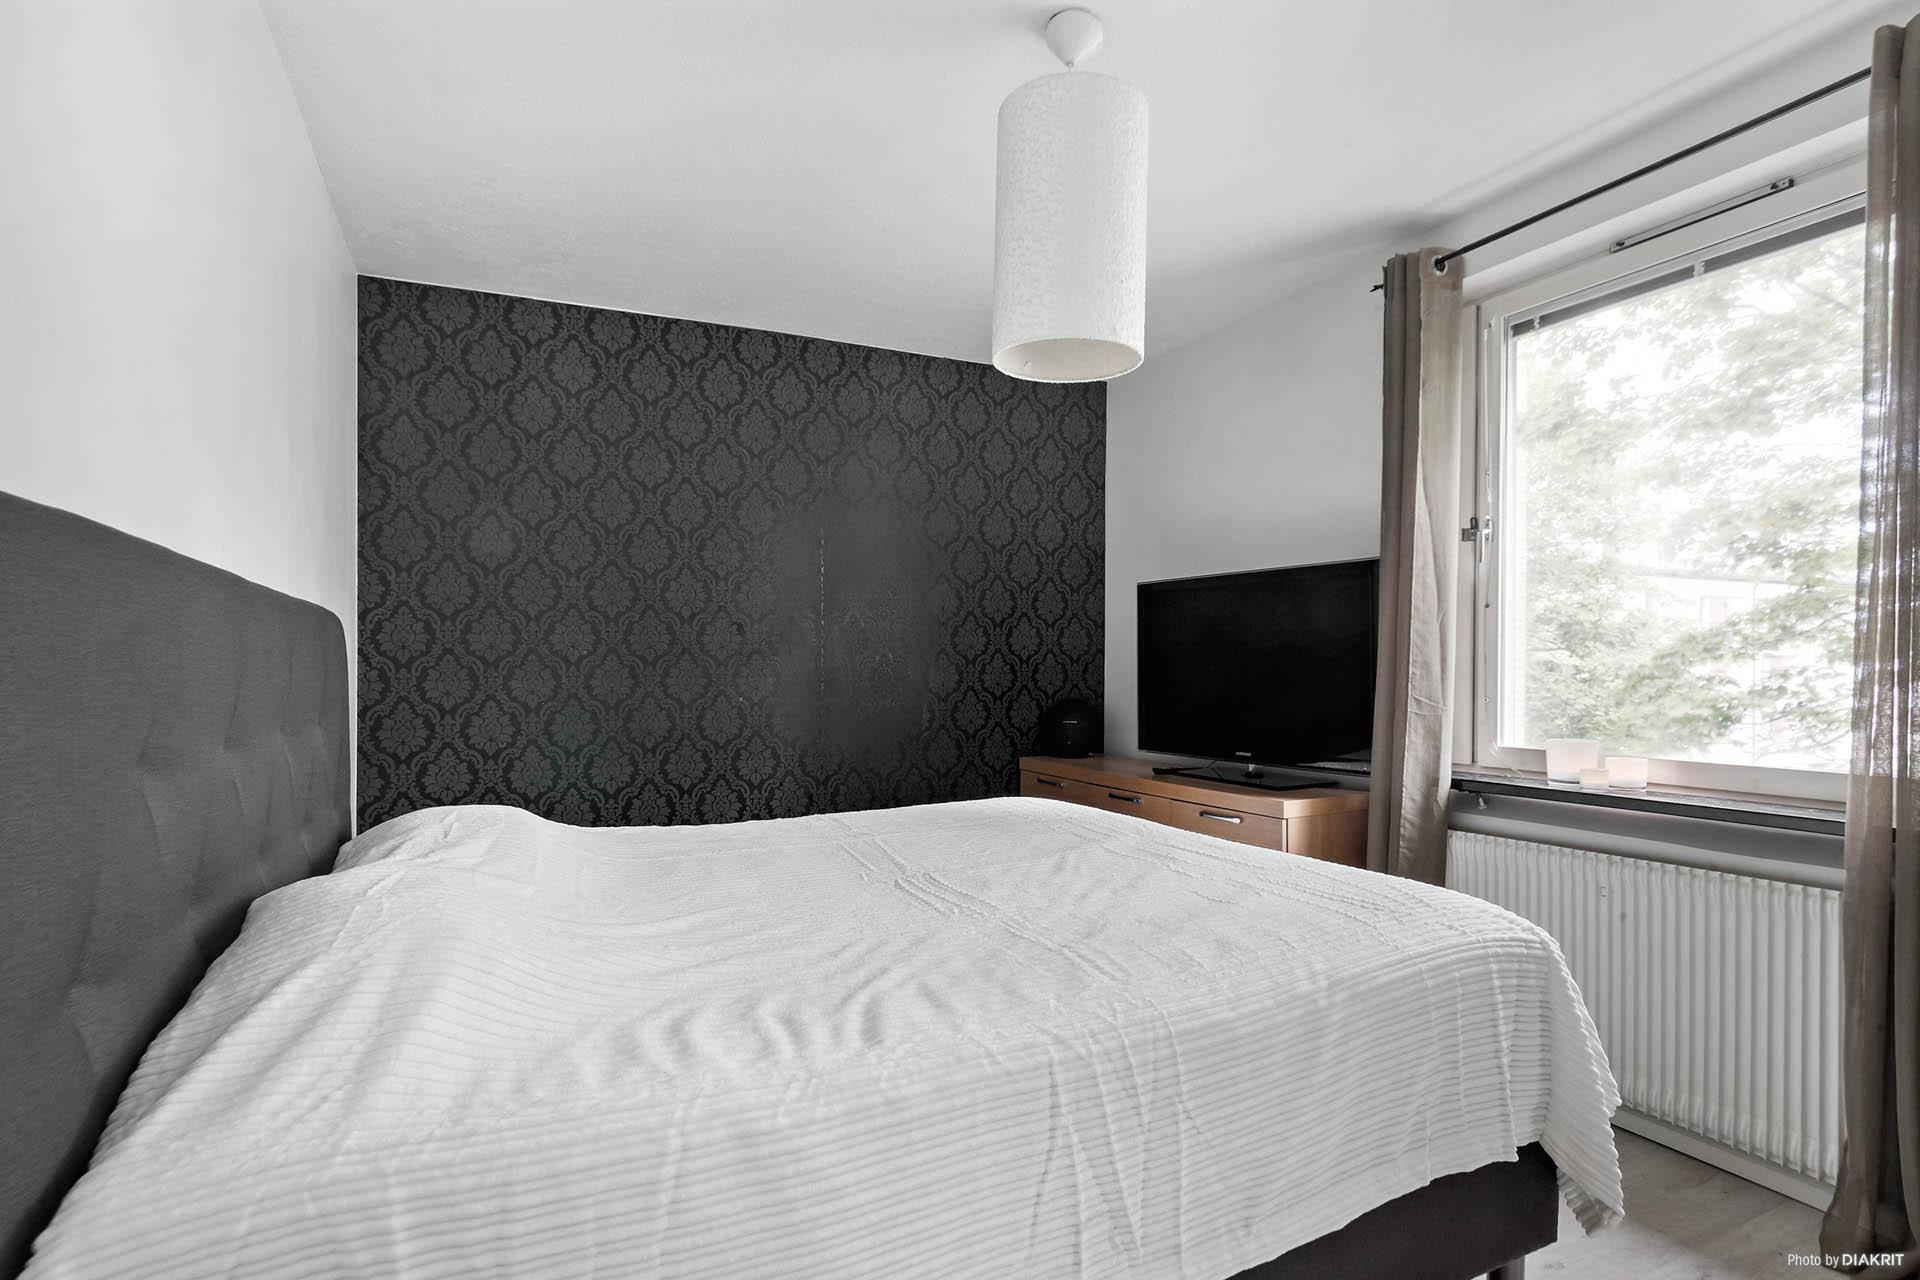 Sovrum 2, med garderobsskåp. Belägen i privat del